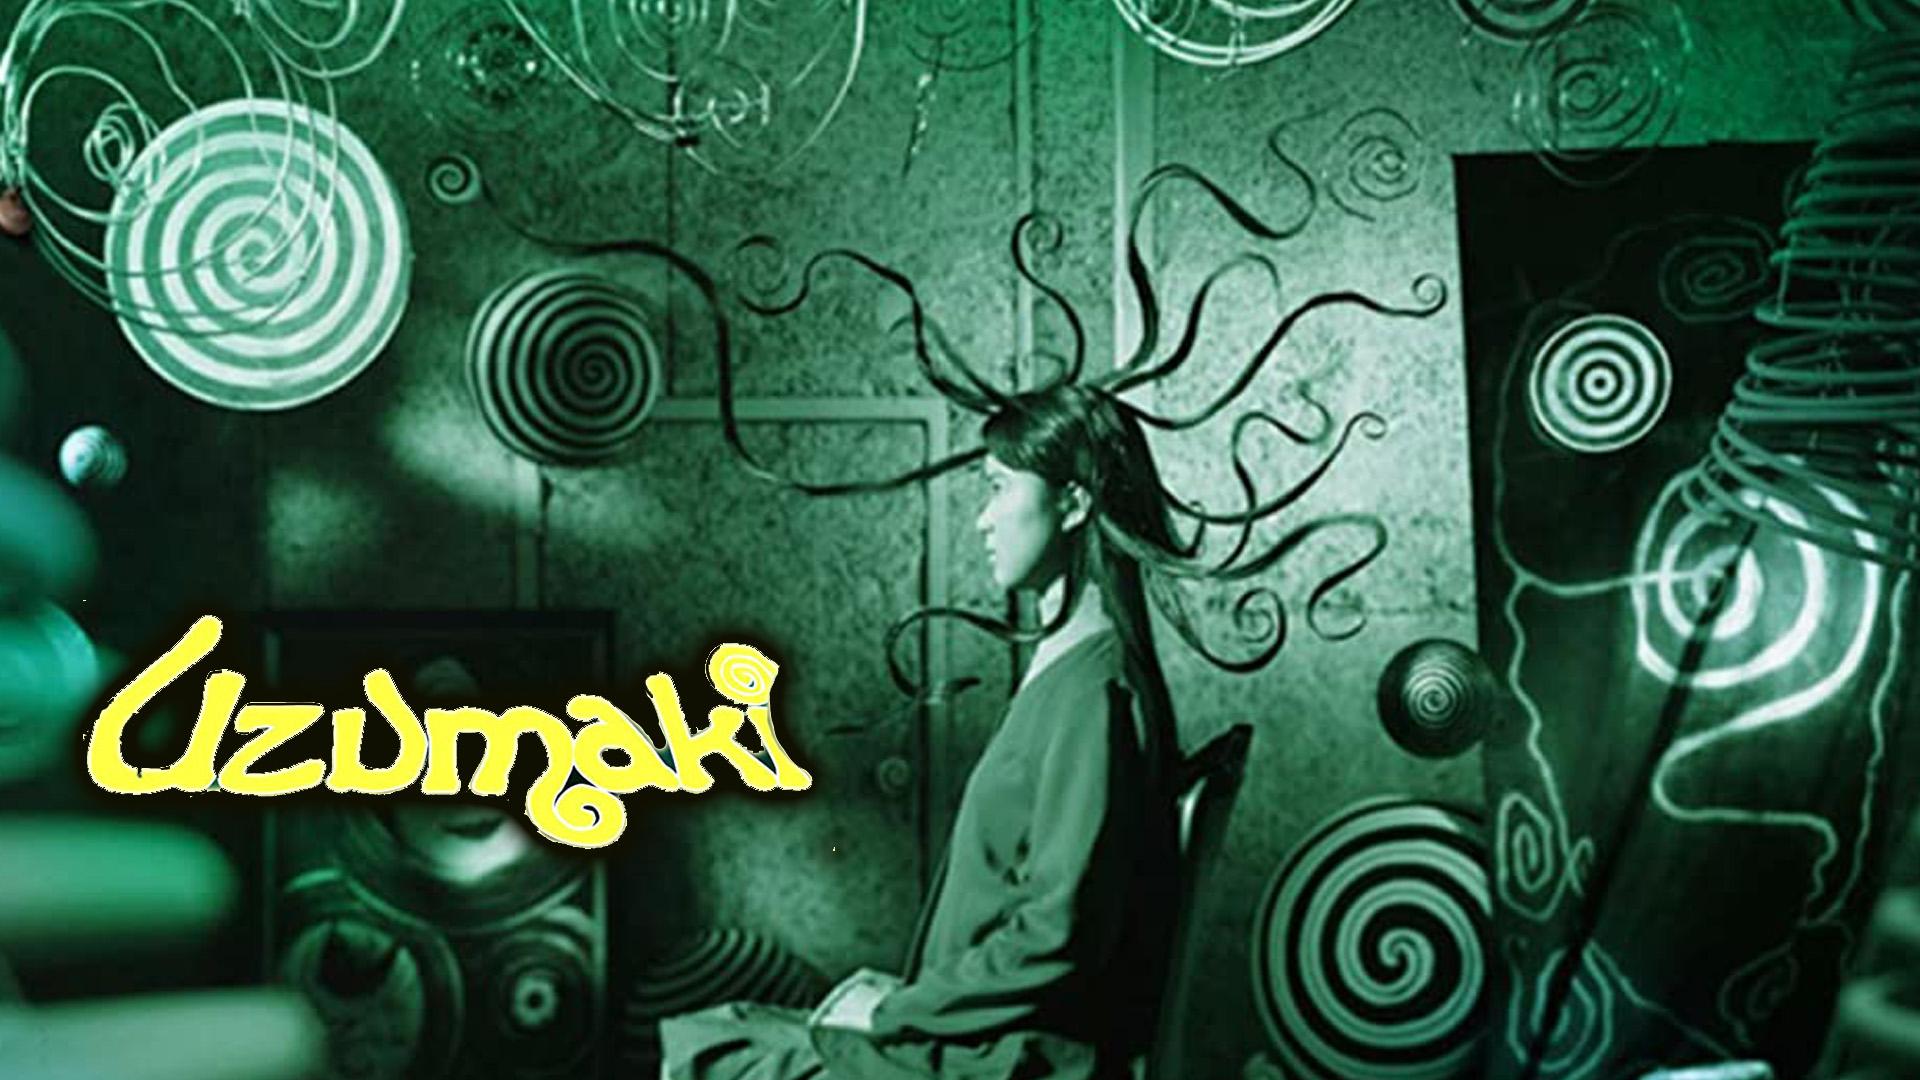 Uzumaki (Spiral) (English subtitled)